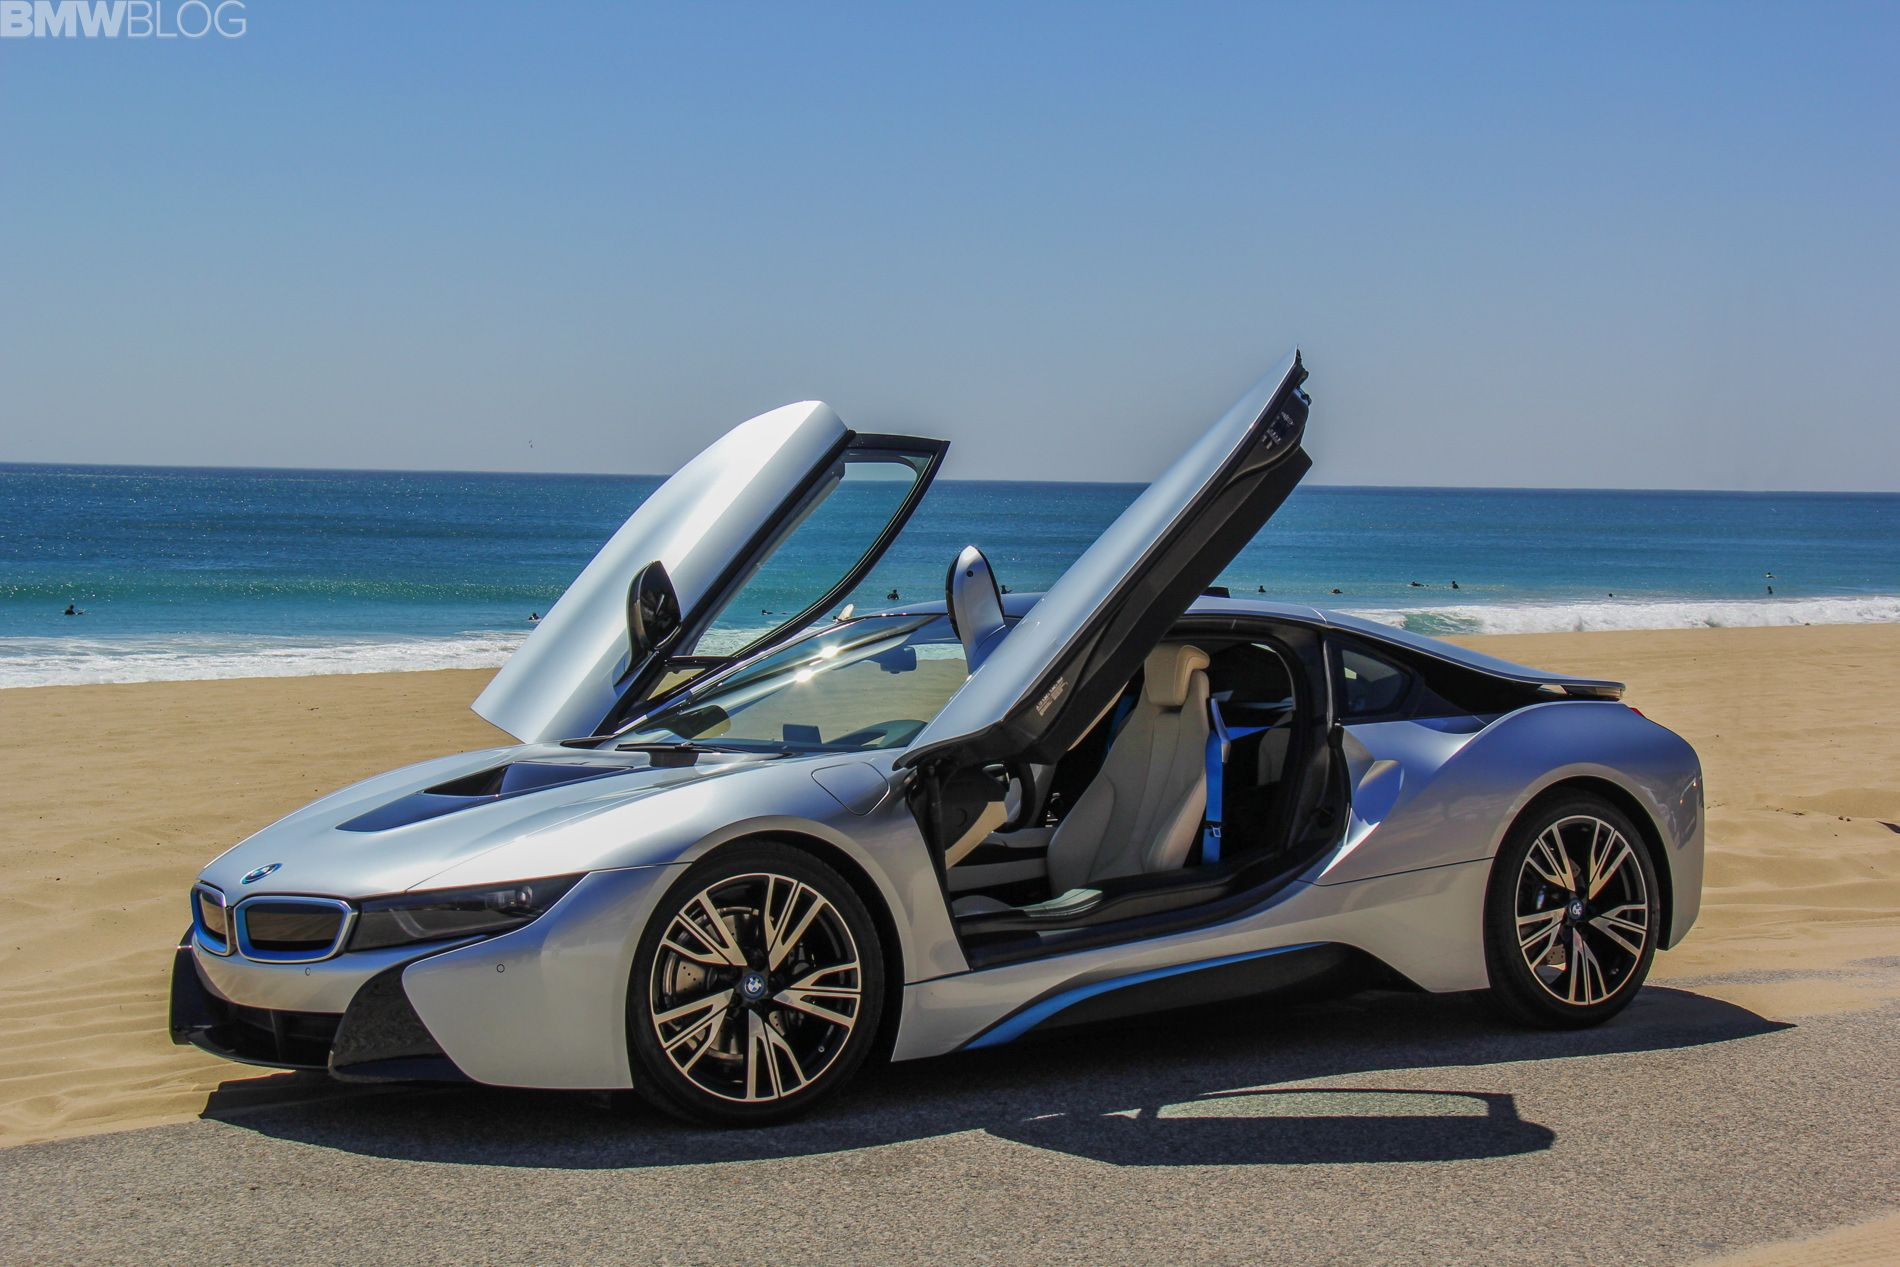 2015 Bmw I8 Bmw Luxury Car Rental Sports Car